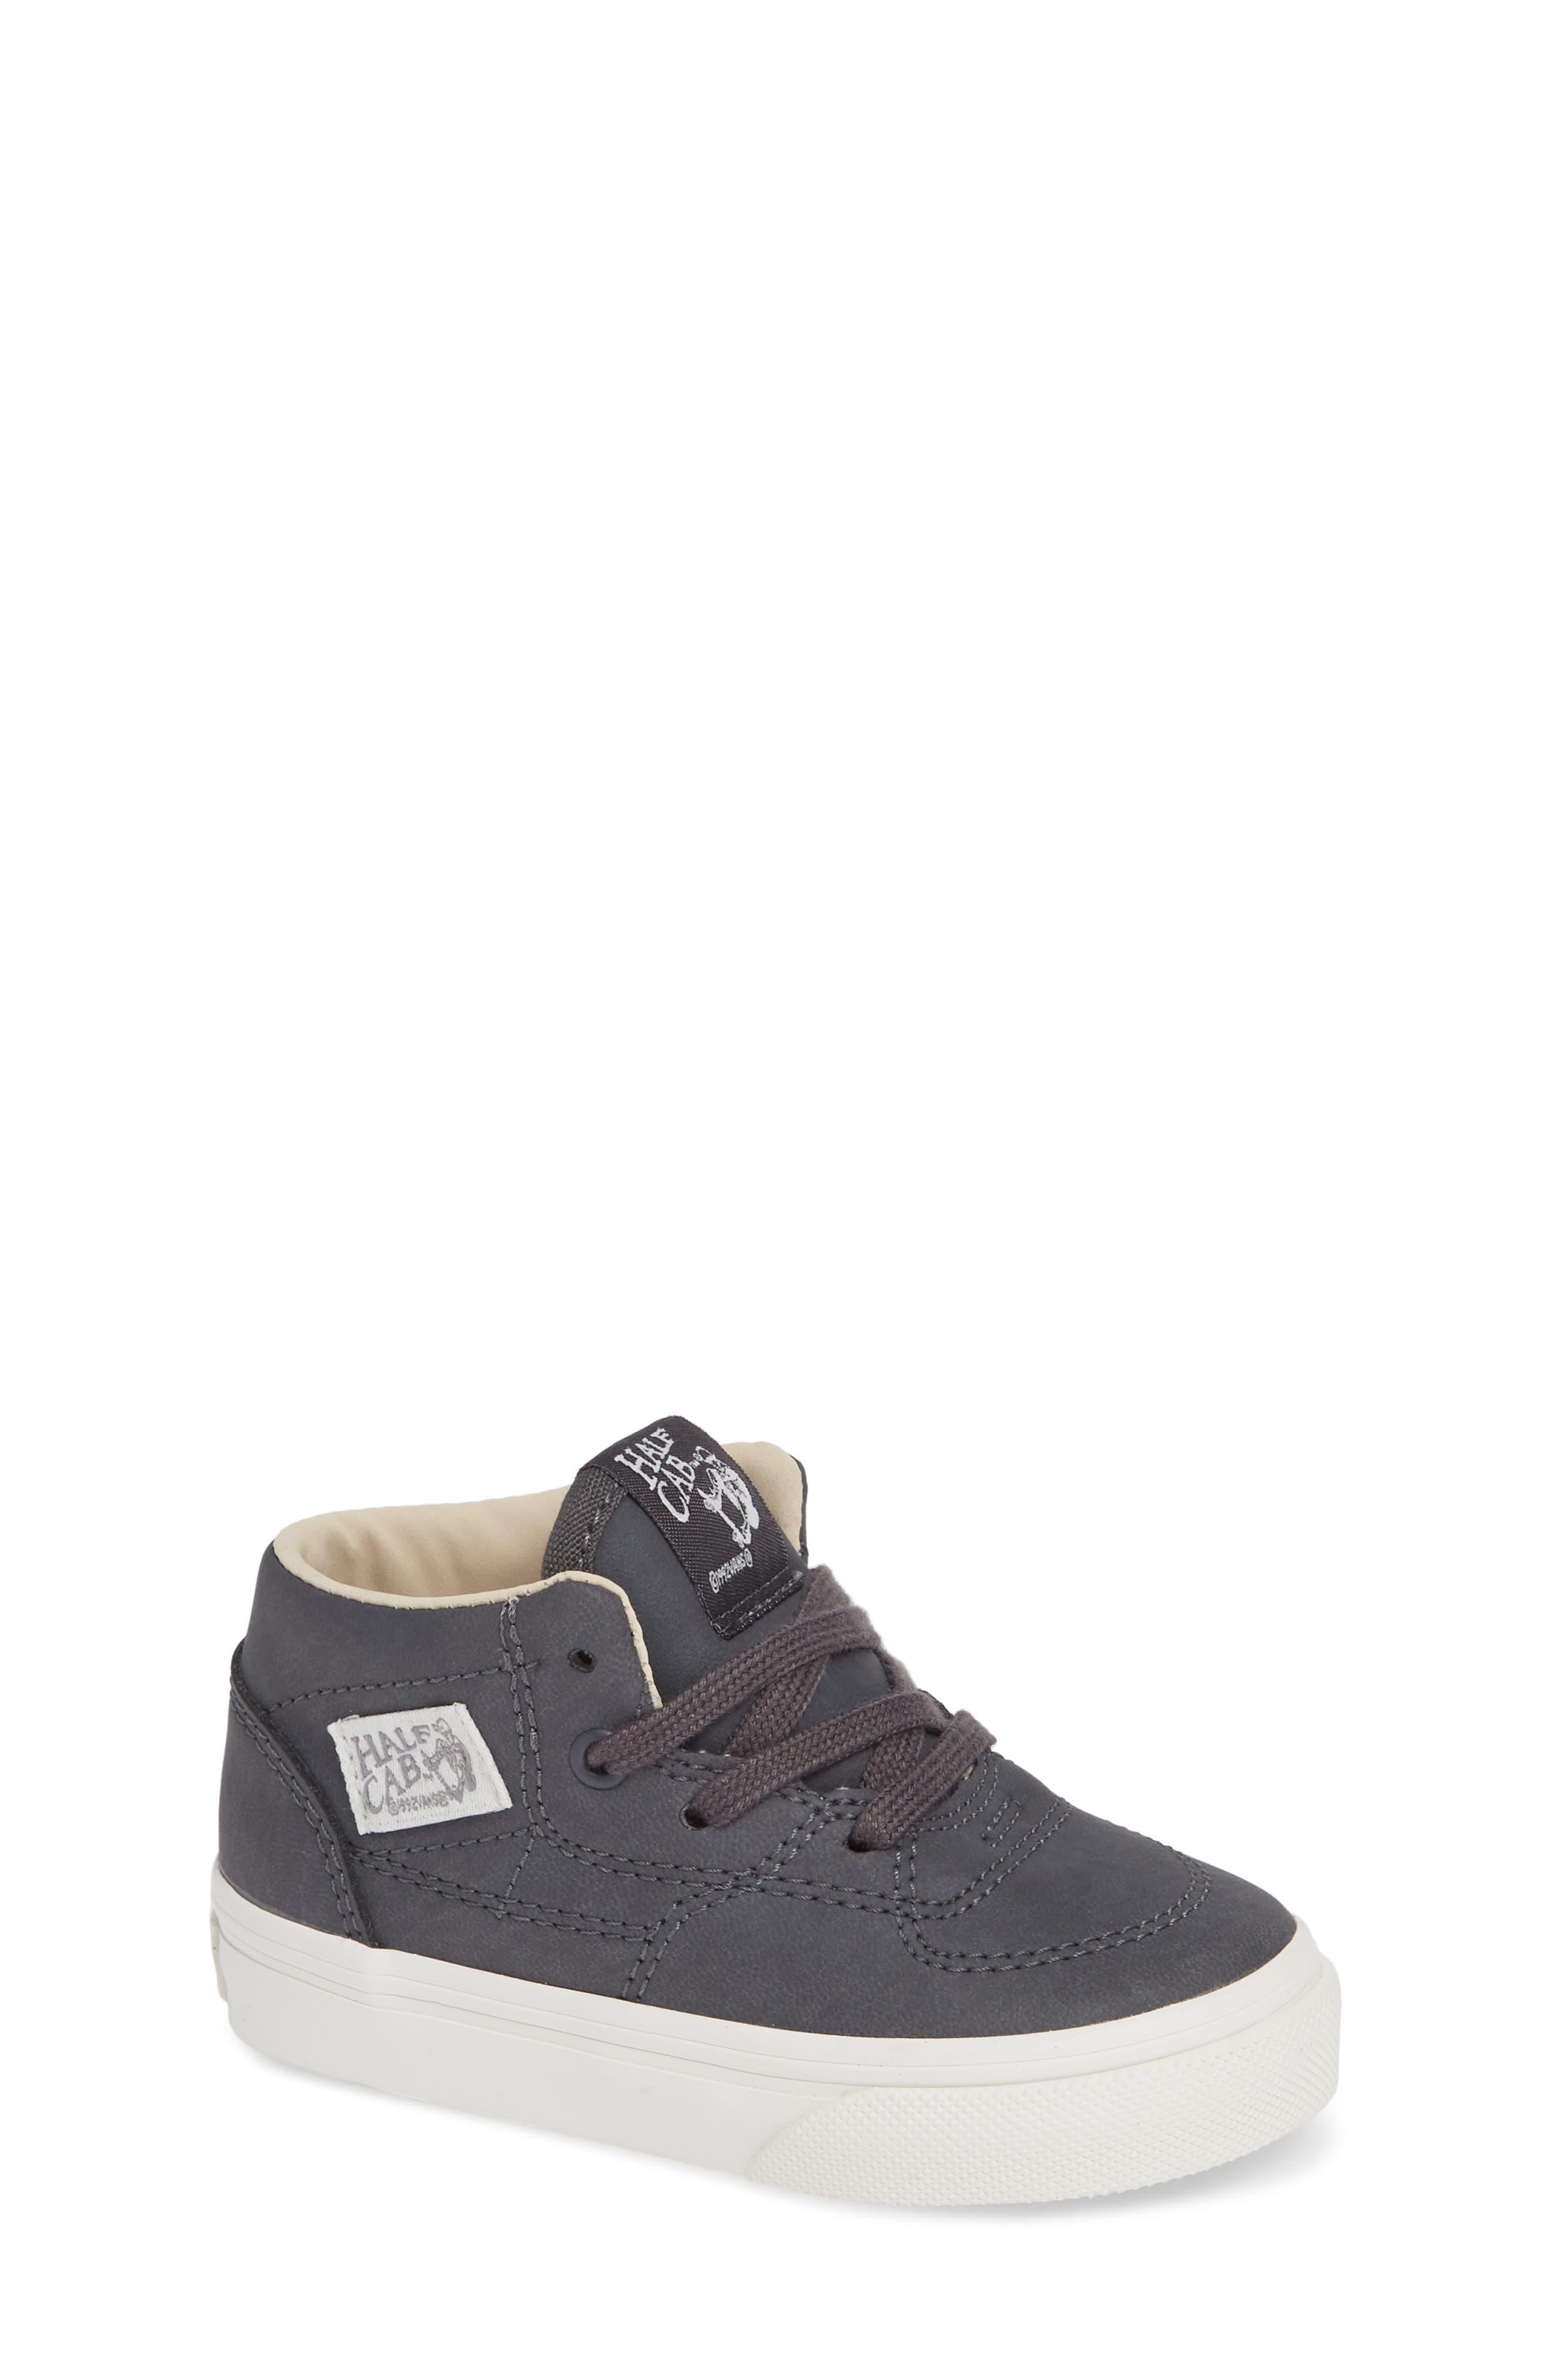 Half Cab Sneaker,                             Main thumbnail 1, color,                             VANSBUCK ASPHALT/ BLANC